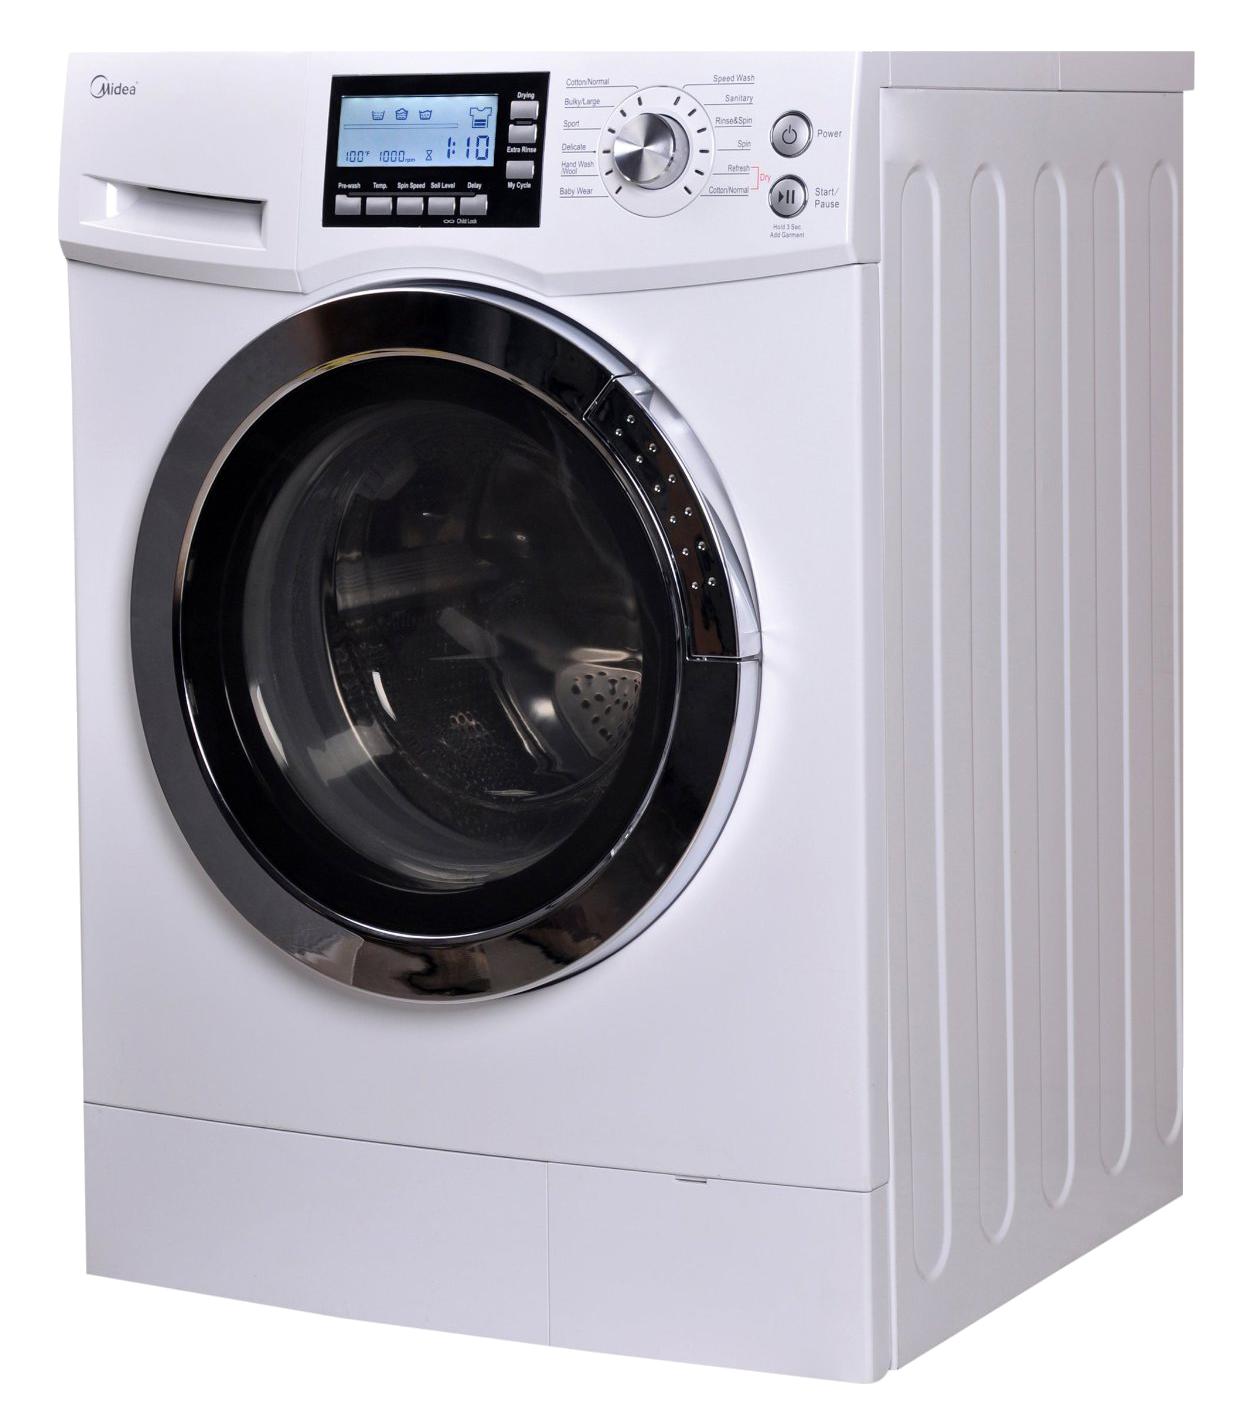 Front Loading Washing Machine PNG Image.